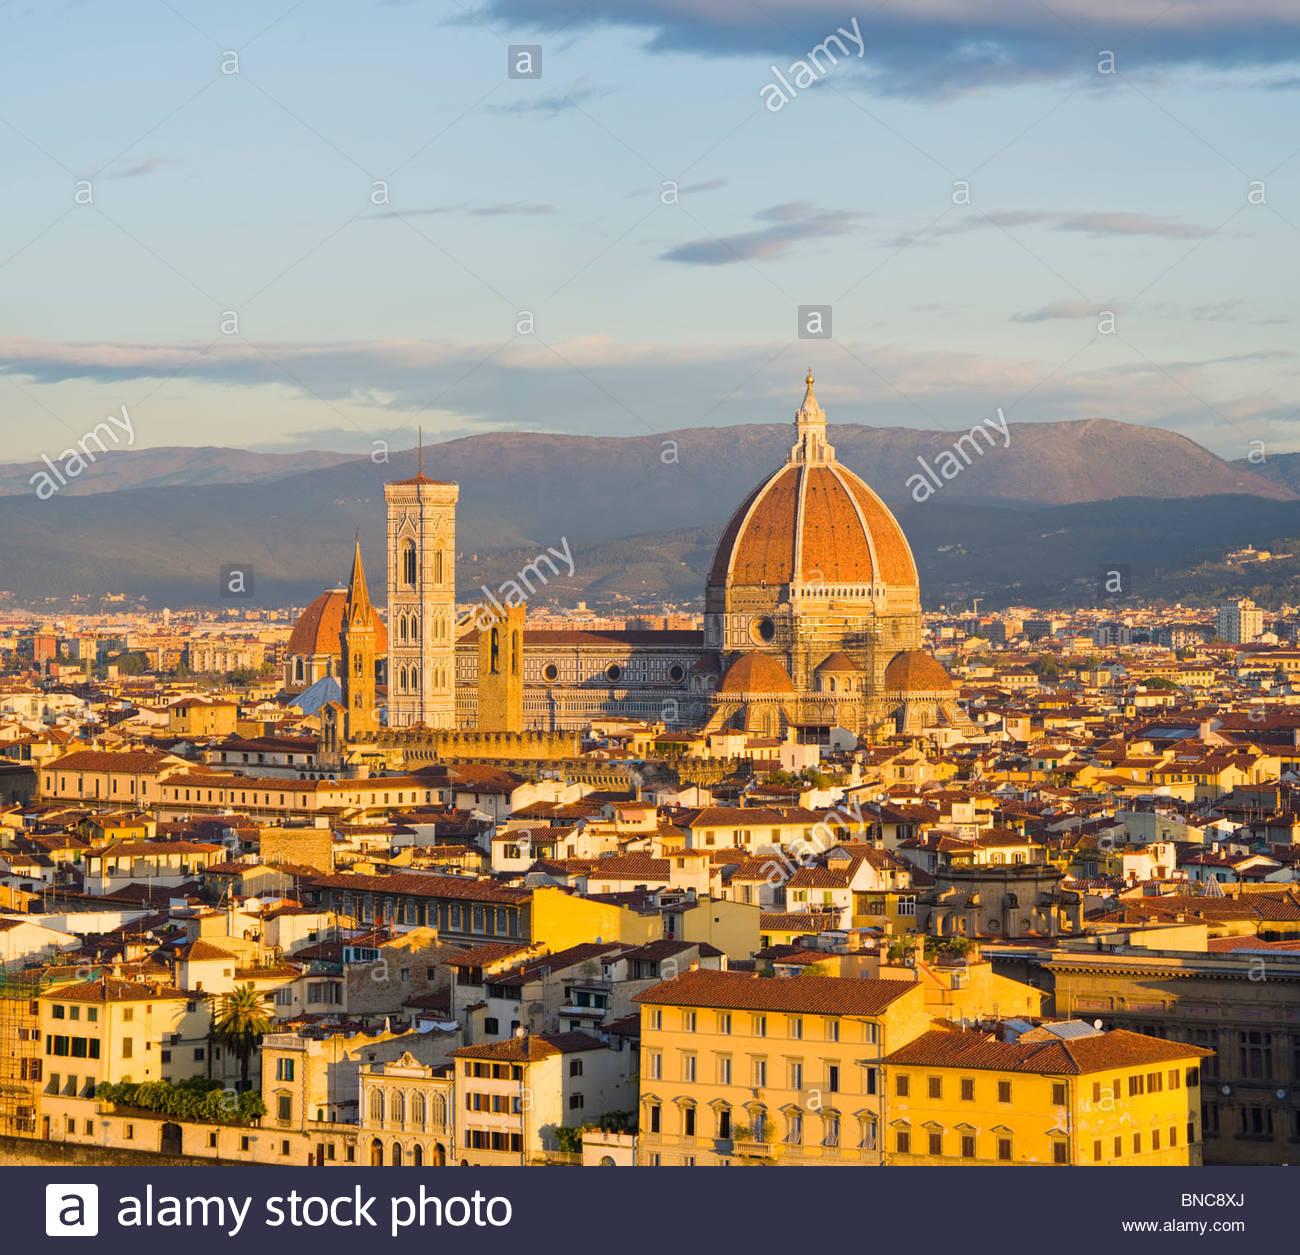 La Cathédrale (Basilique de Santa Maria del Fiore), Florence, Toscane, Italie. Photo Stock